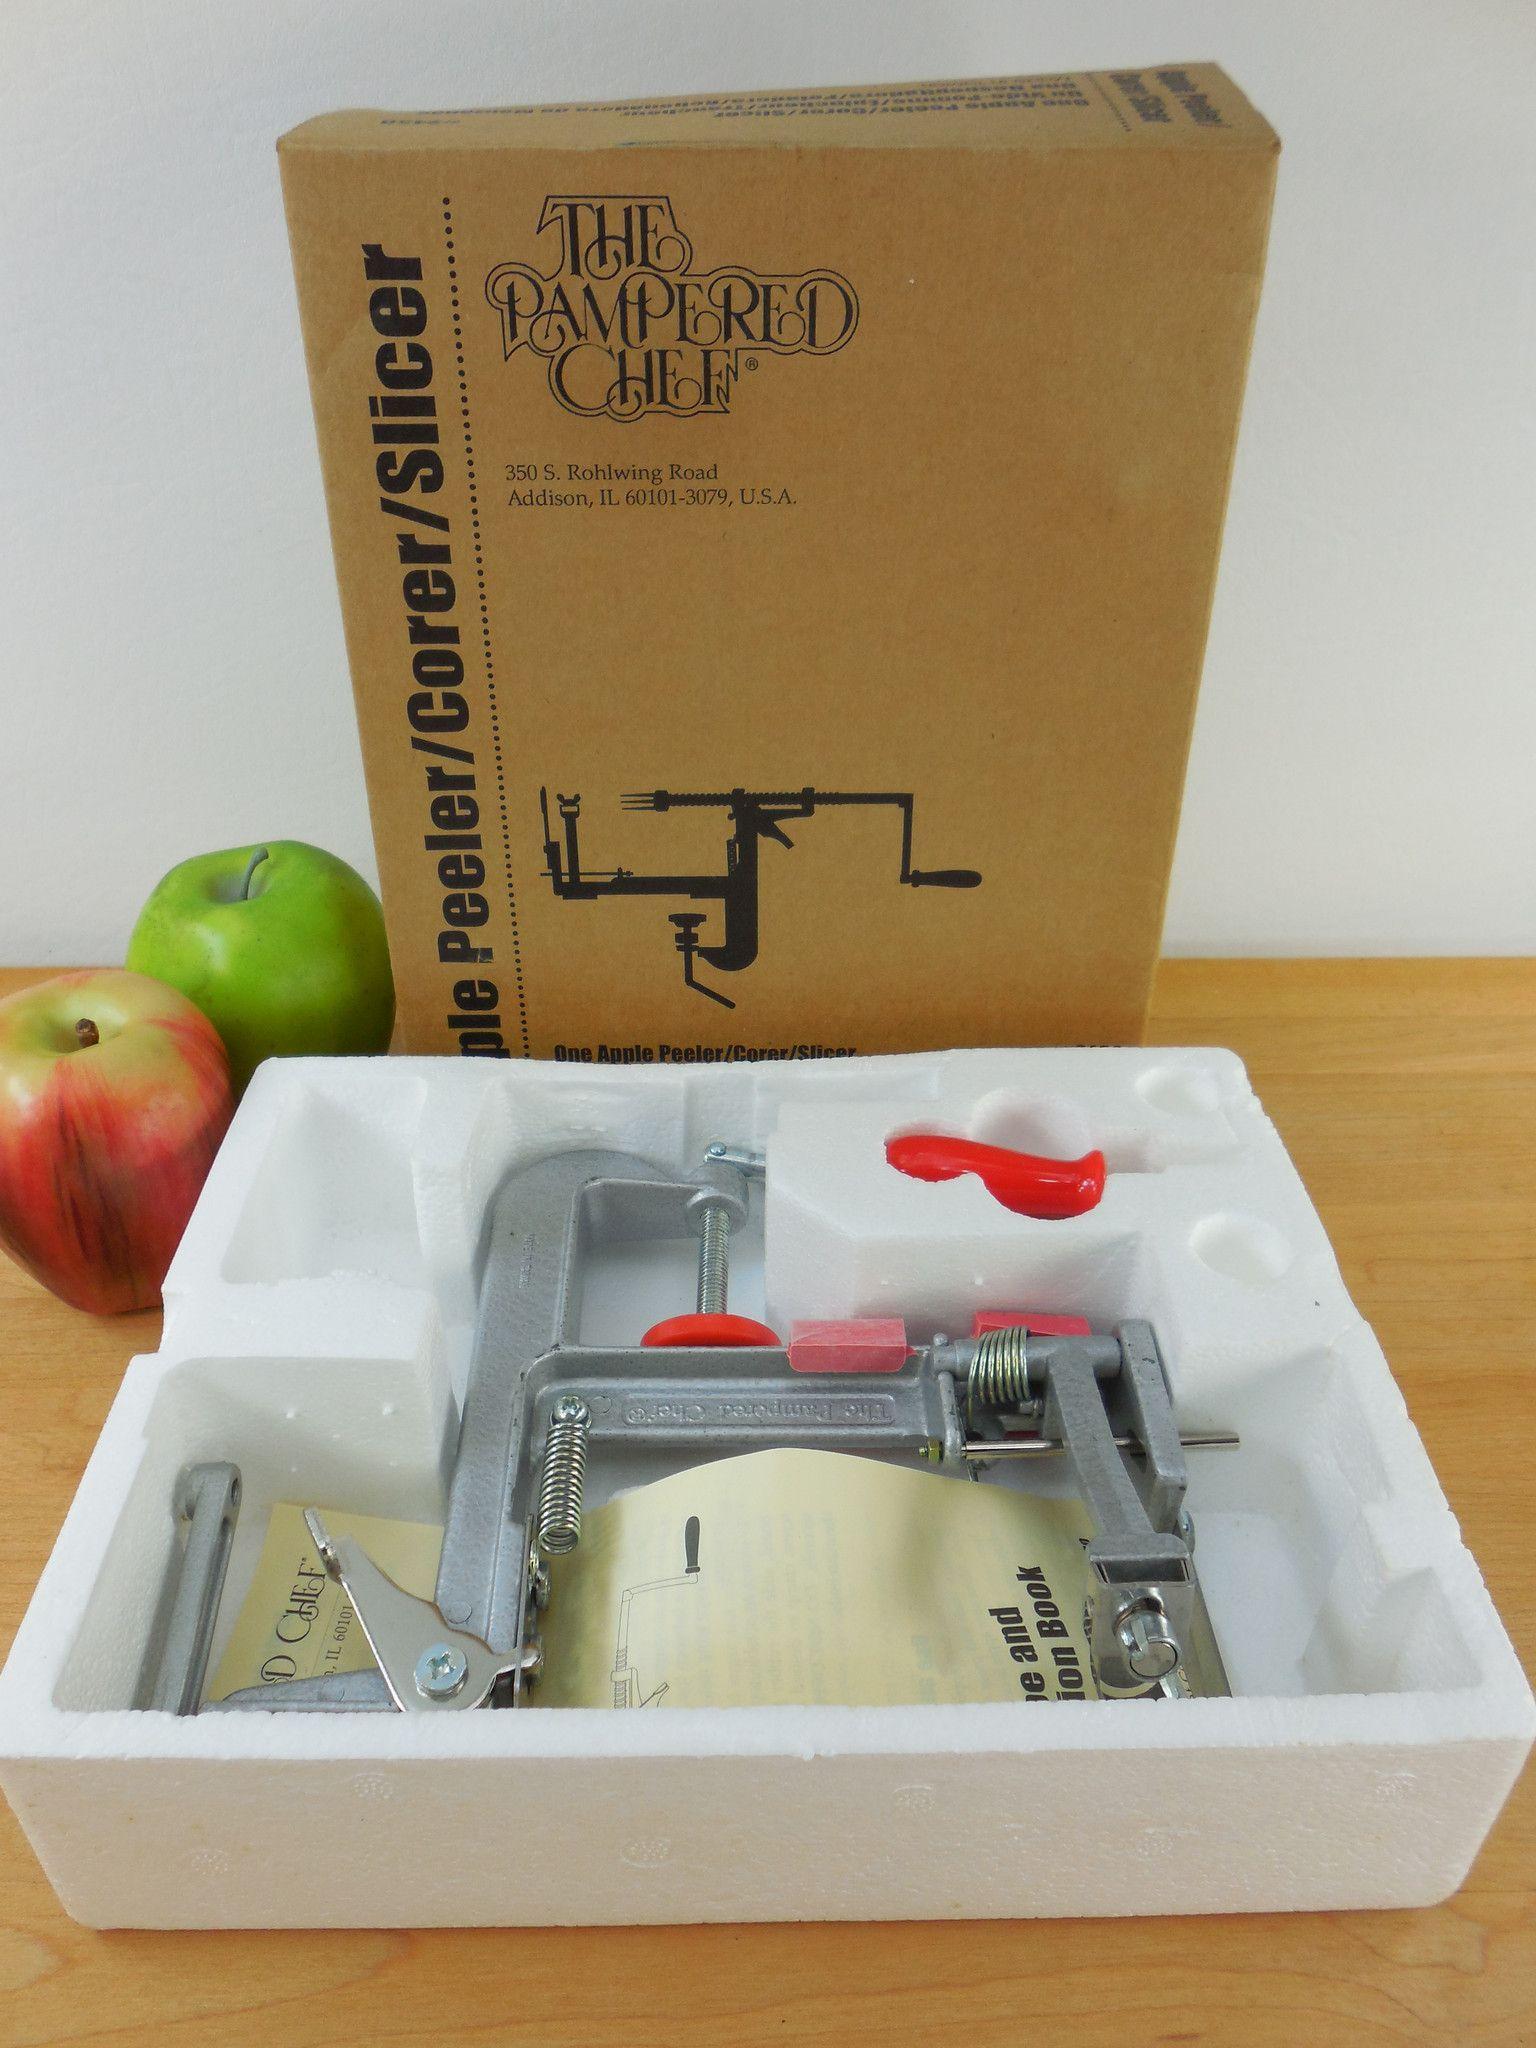 The Pampered Chef Apple Peeler Corer in Original Box... New NIB